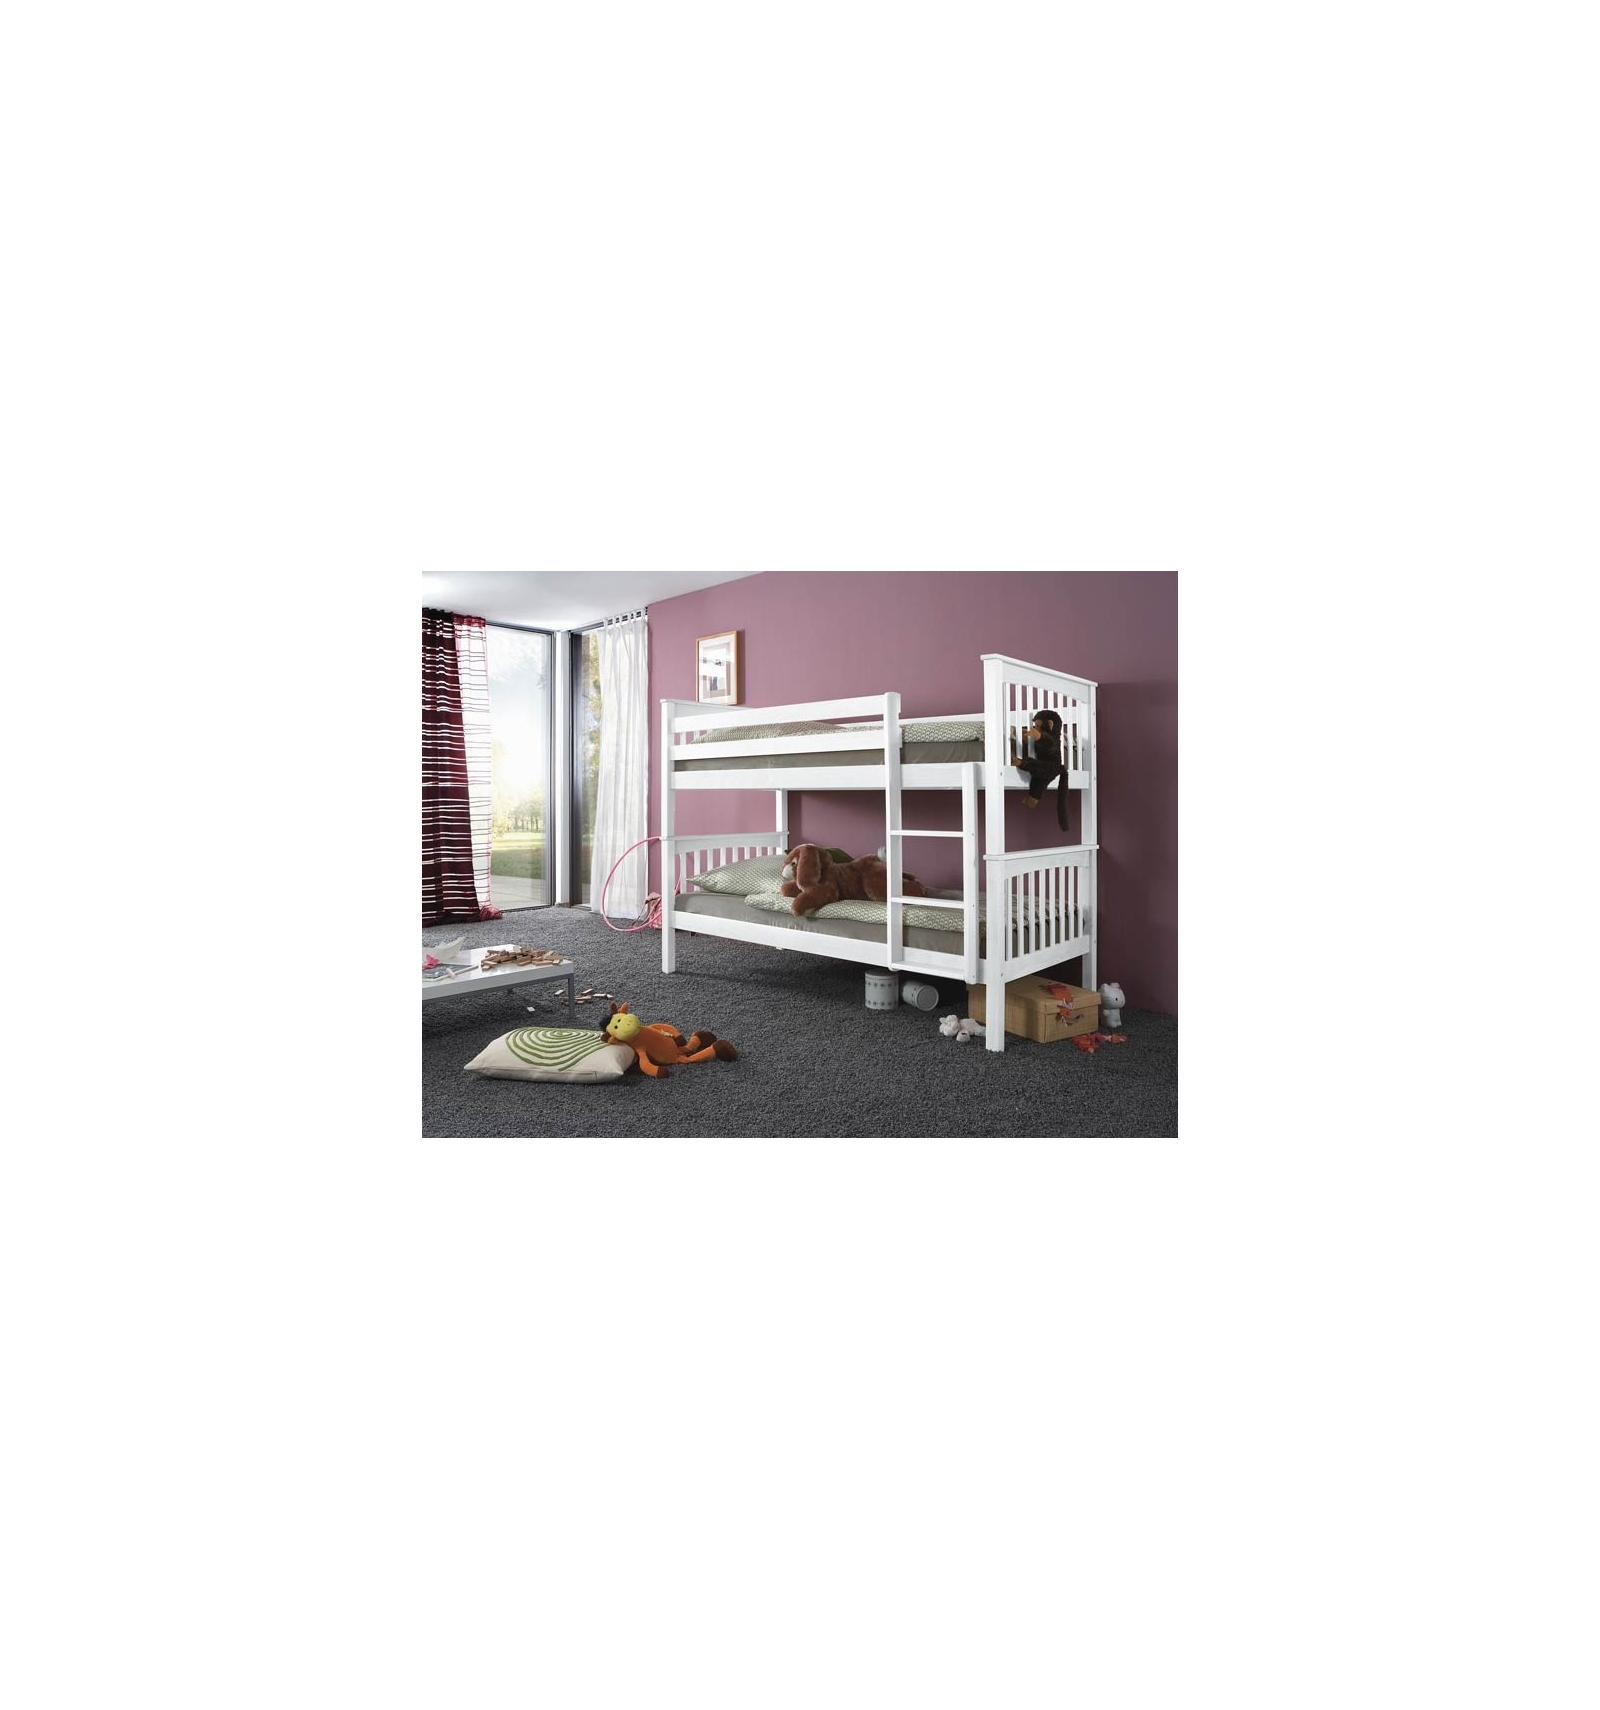 lit mezzanine. Black Bedroom Furniture Sets. Home Design Ideas